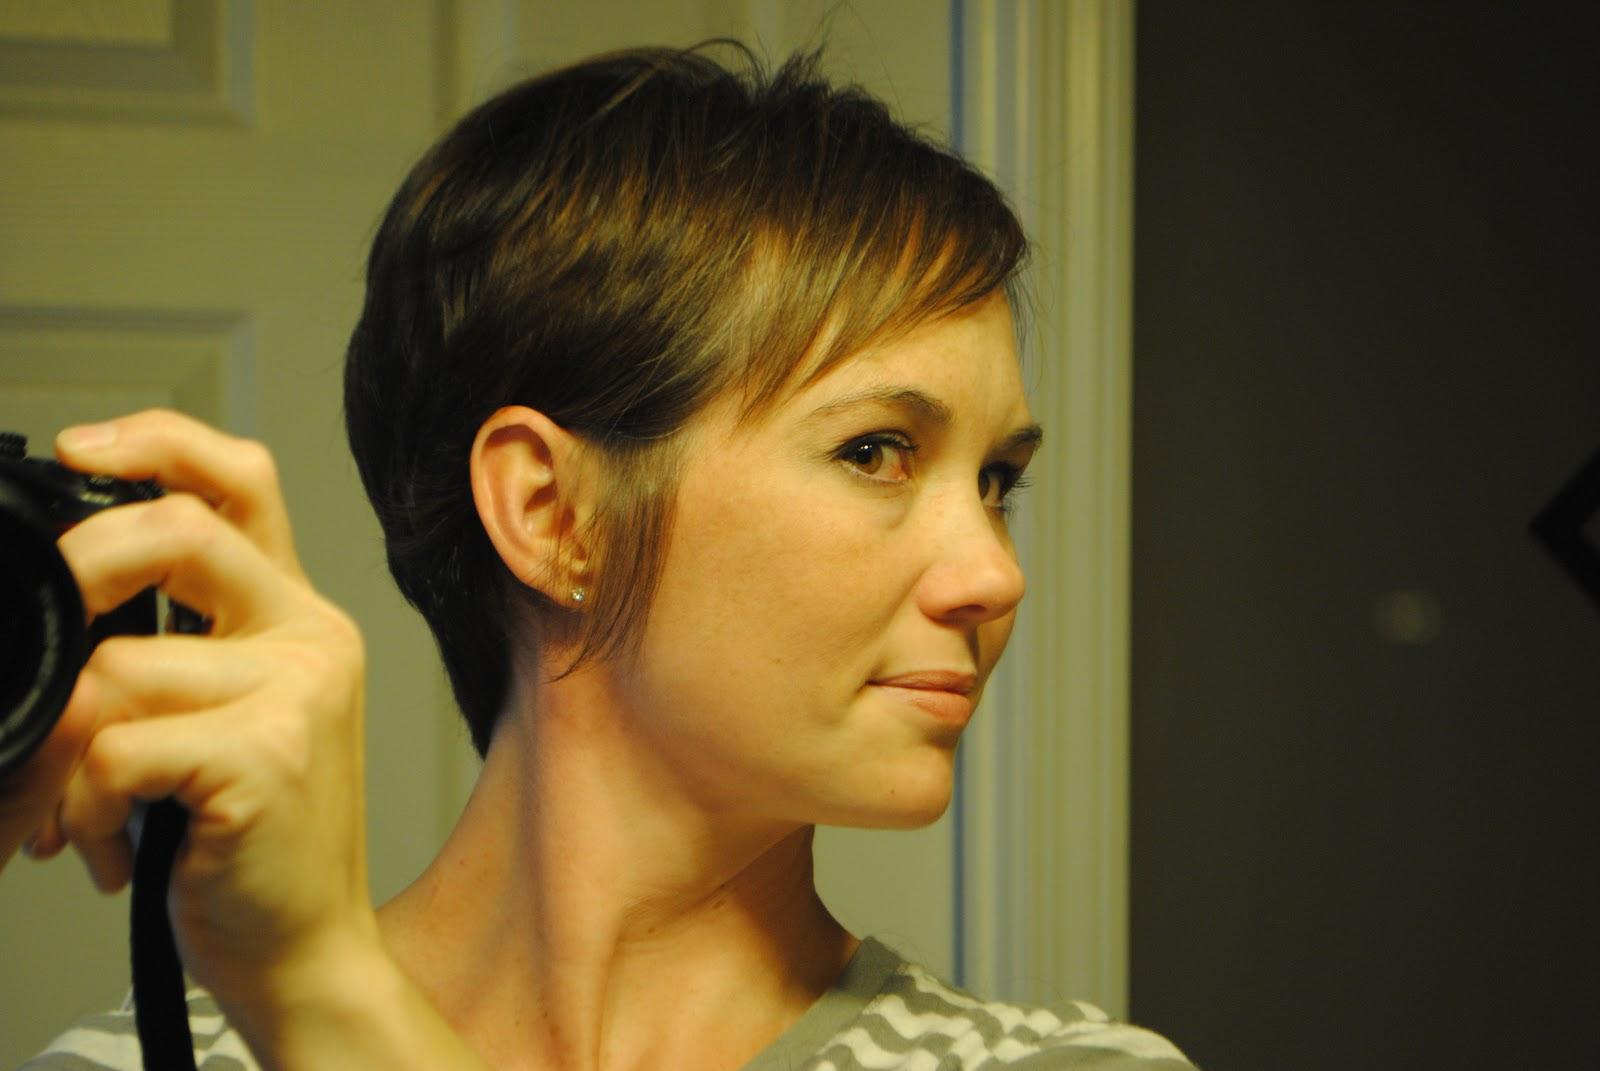 christy mack haircut - photo #6